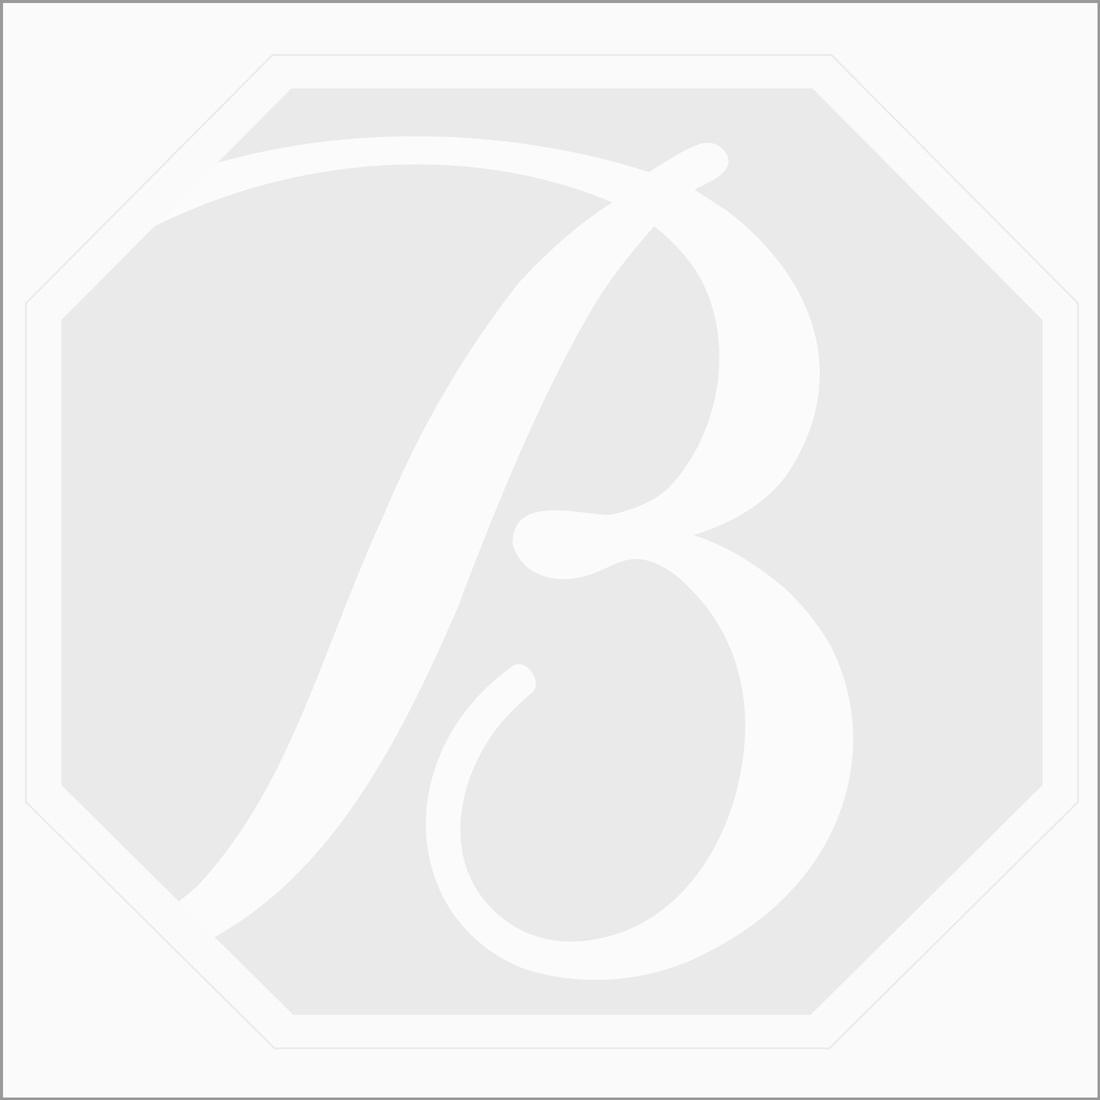 8.30 x 6 mm - Medium Maroon Rose Cut Diamond Cushion Shape - 2.03 carats (FncyDiaRC1069)